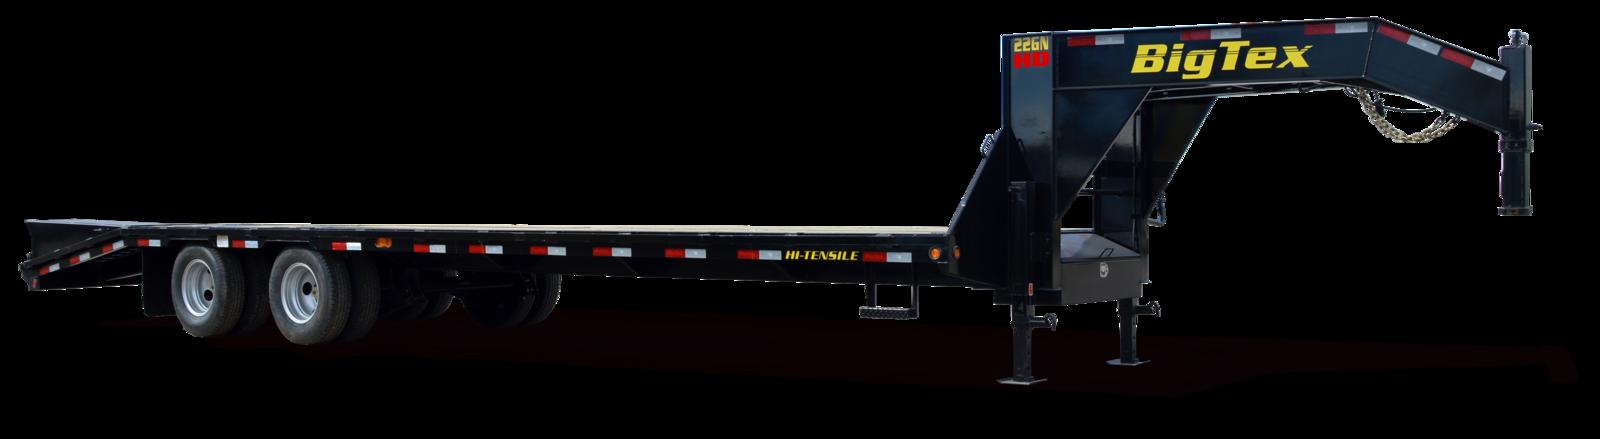 Big Tex 2019 22gn 25bk 5 102 X 25 Tandem Dual Wheel Wiring Harness Curb Side